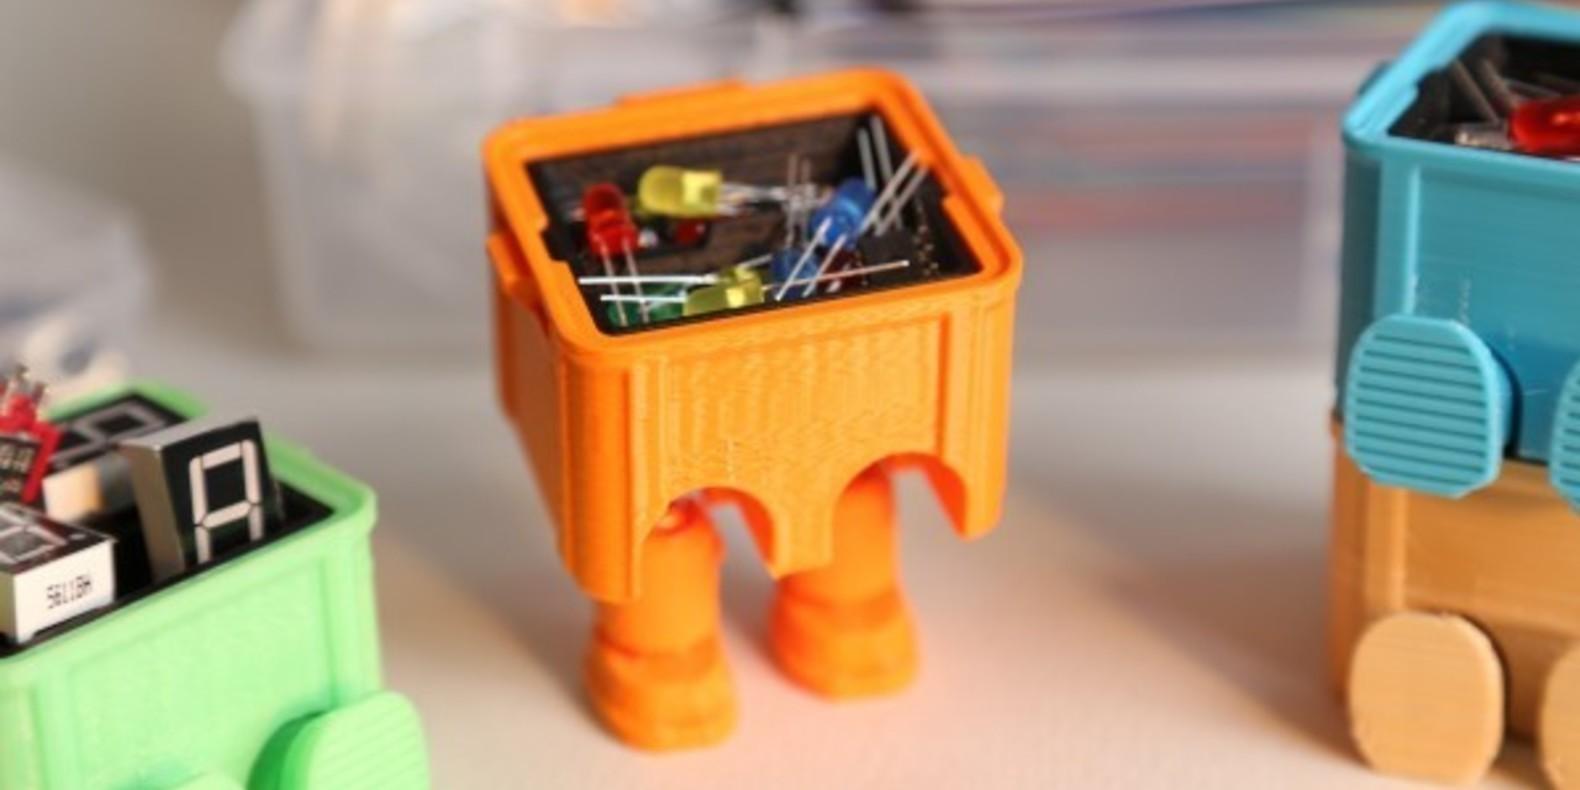 Step box step boite a outils tool box 3D printed 3D printing imprimée en 3D impression 3D Cults 4